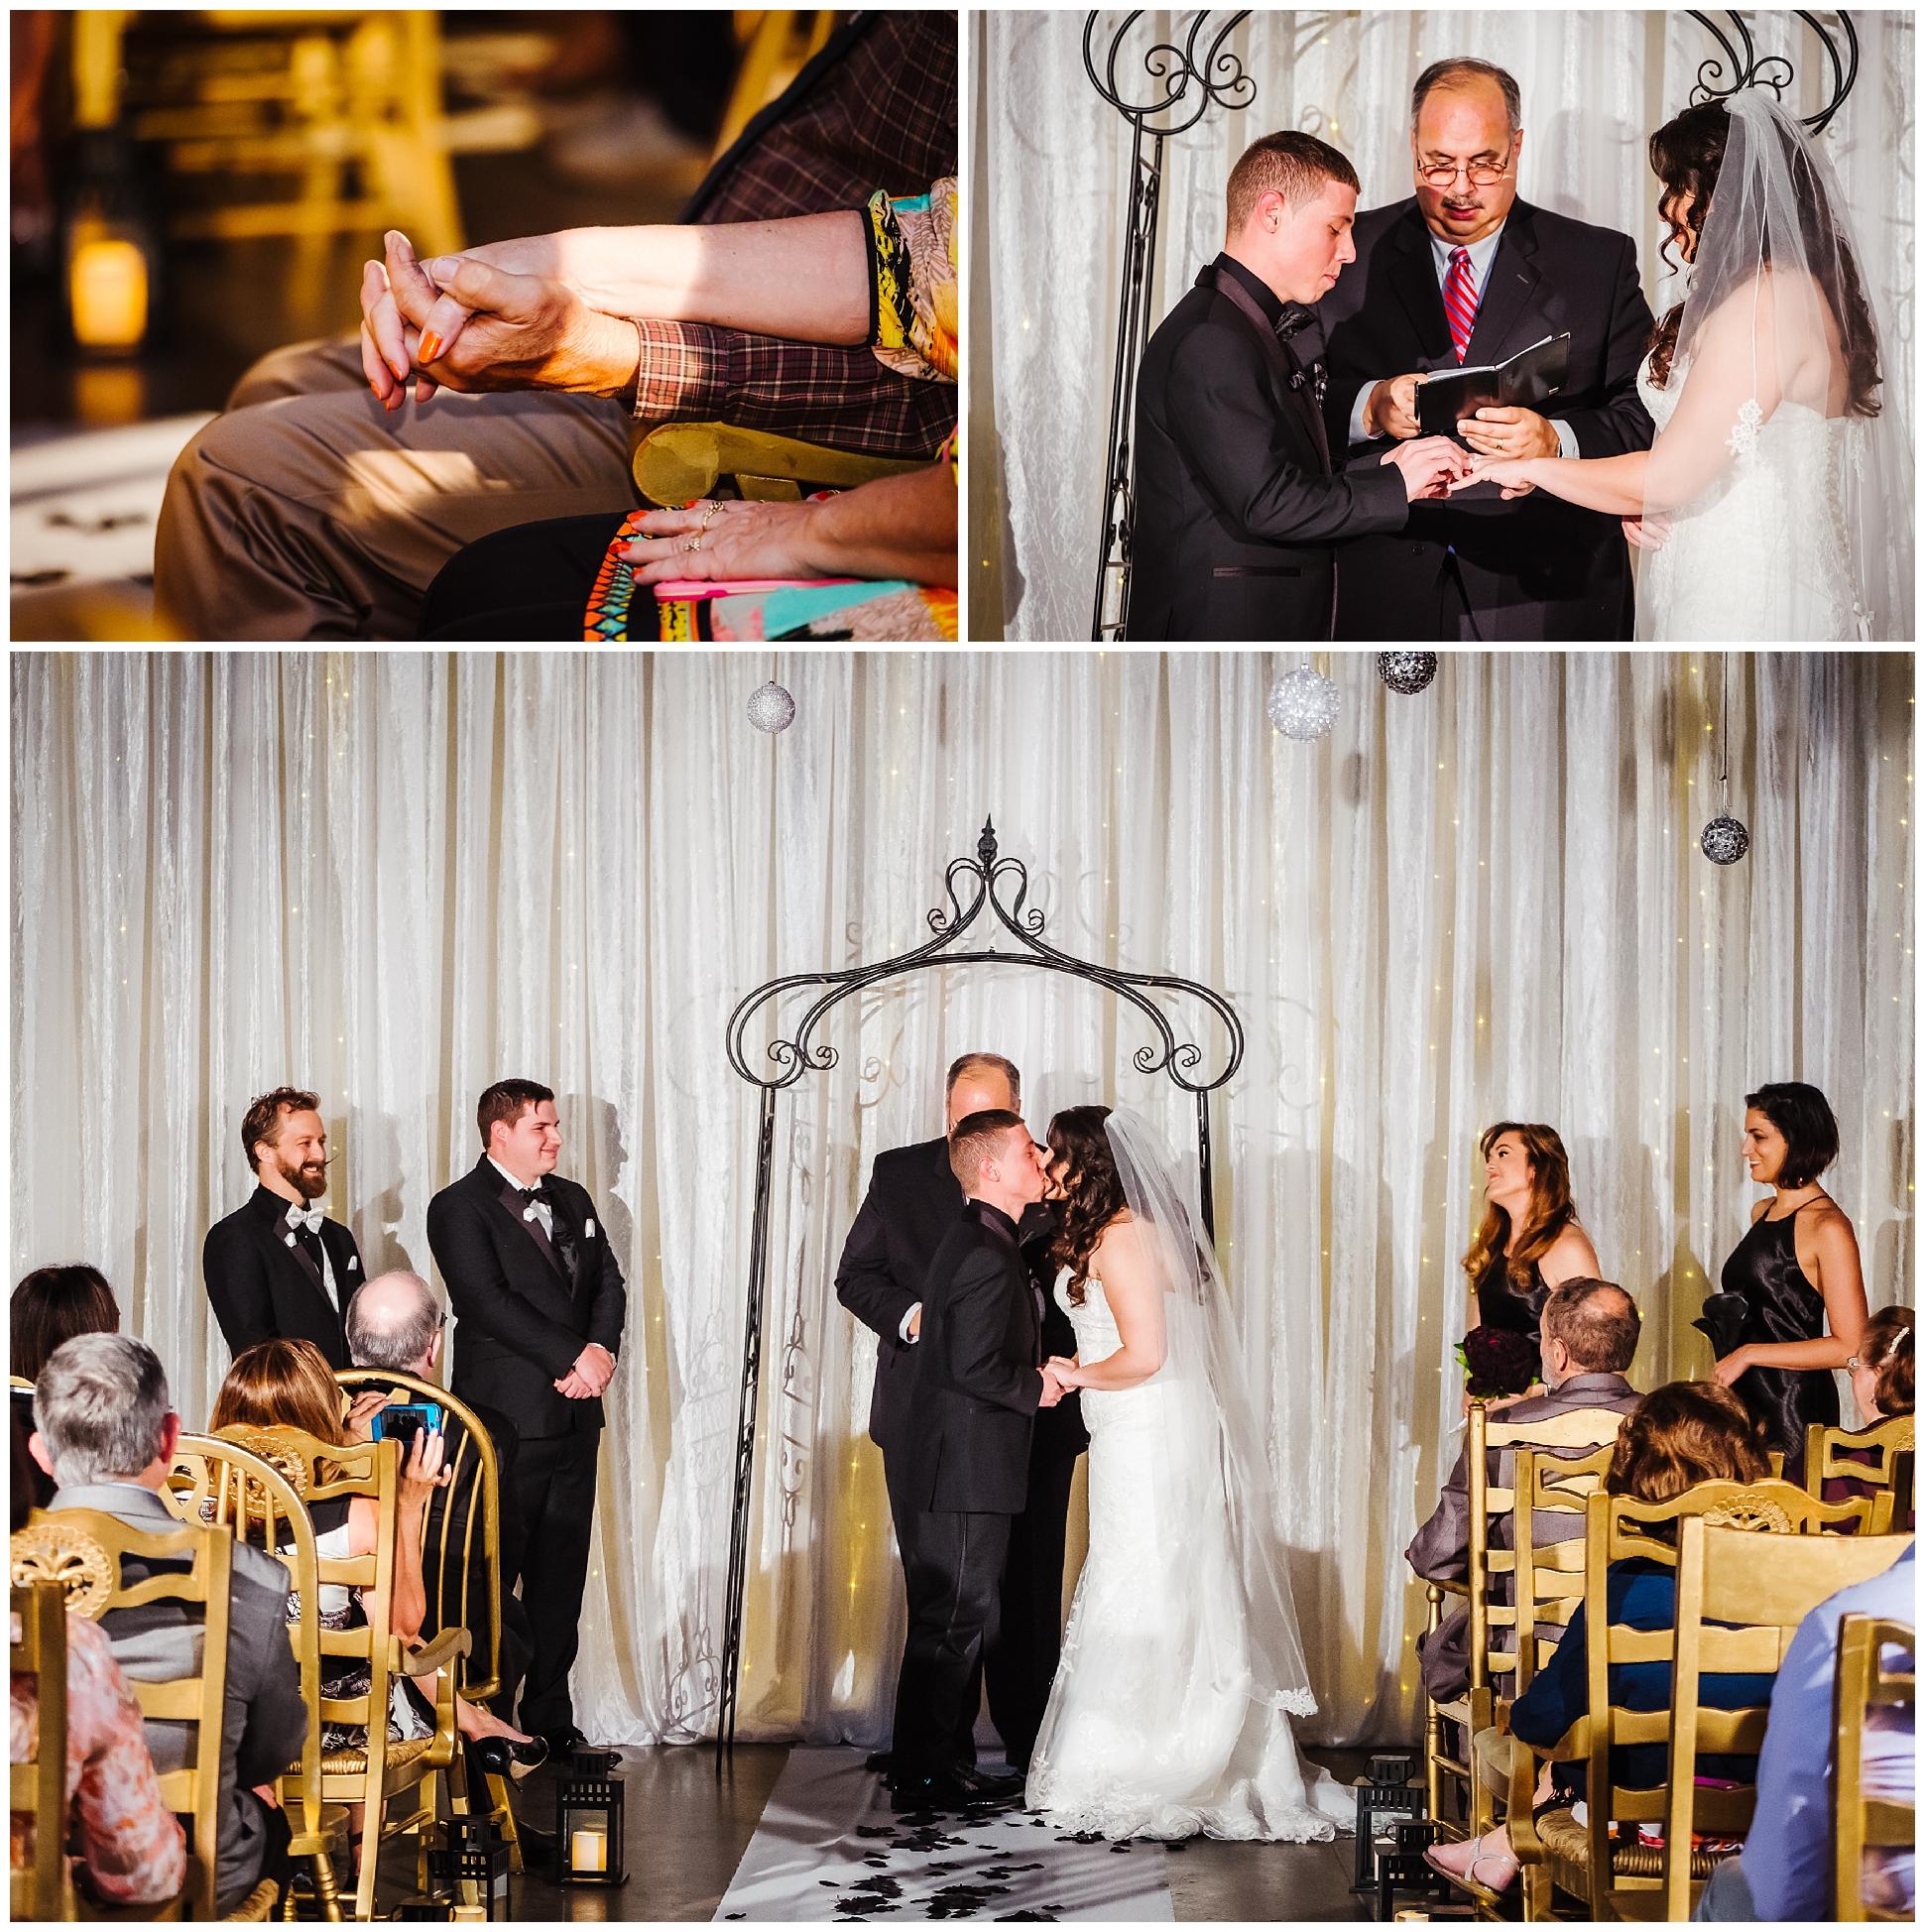 tampa-wedding-photographer-unique-indoor-venue_0027.jpg